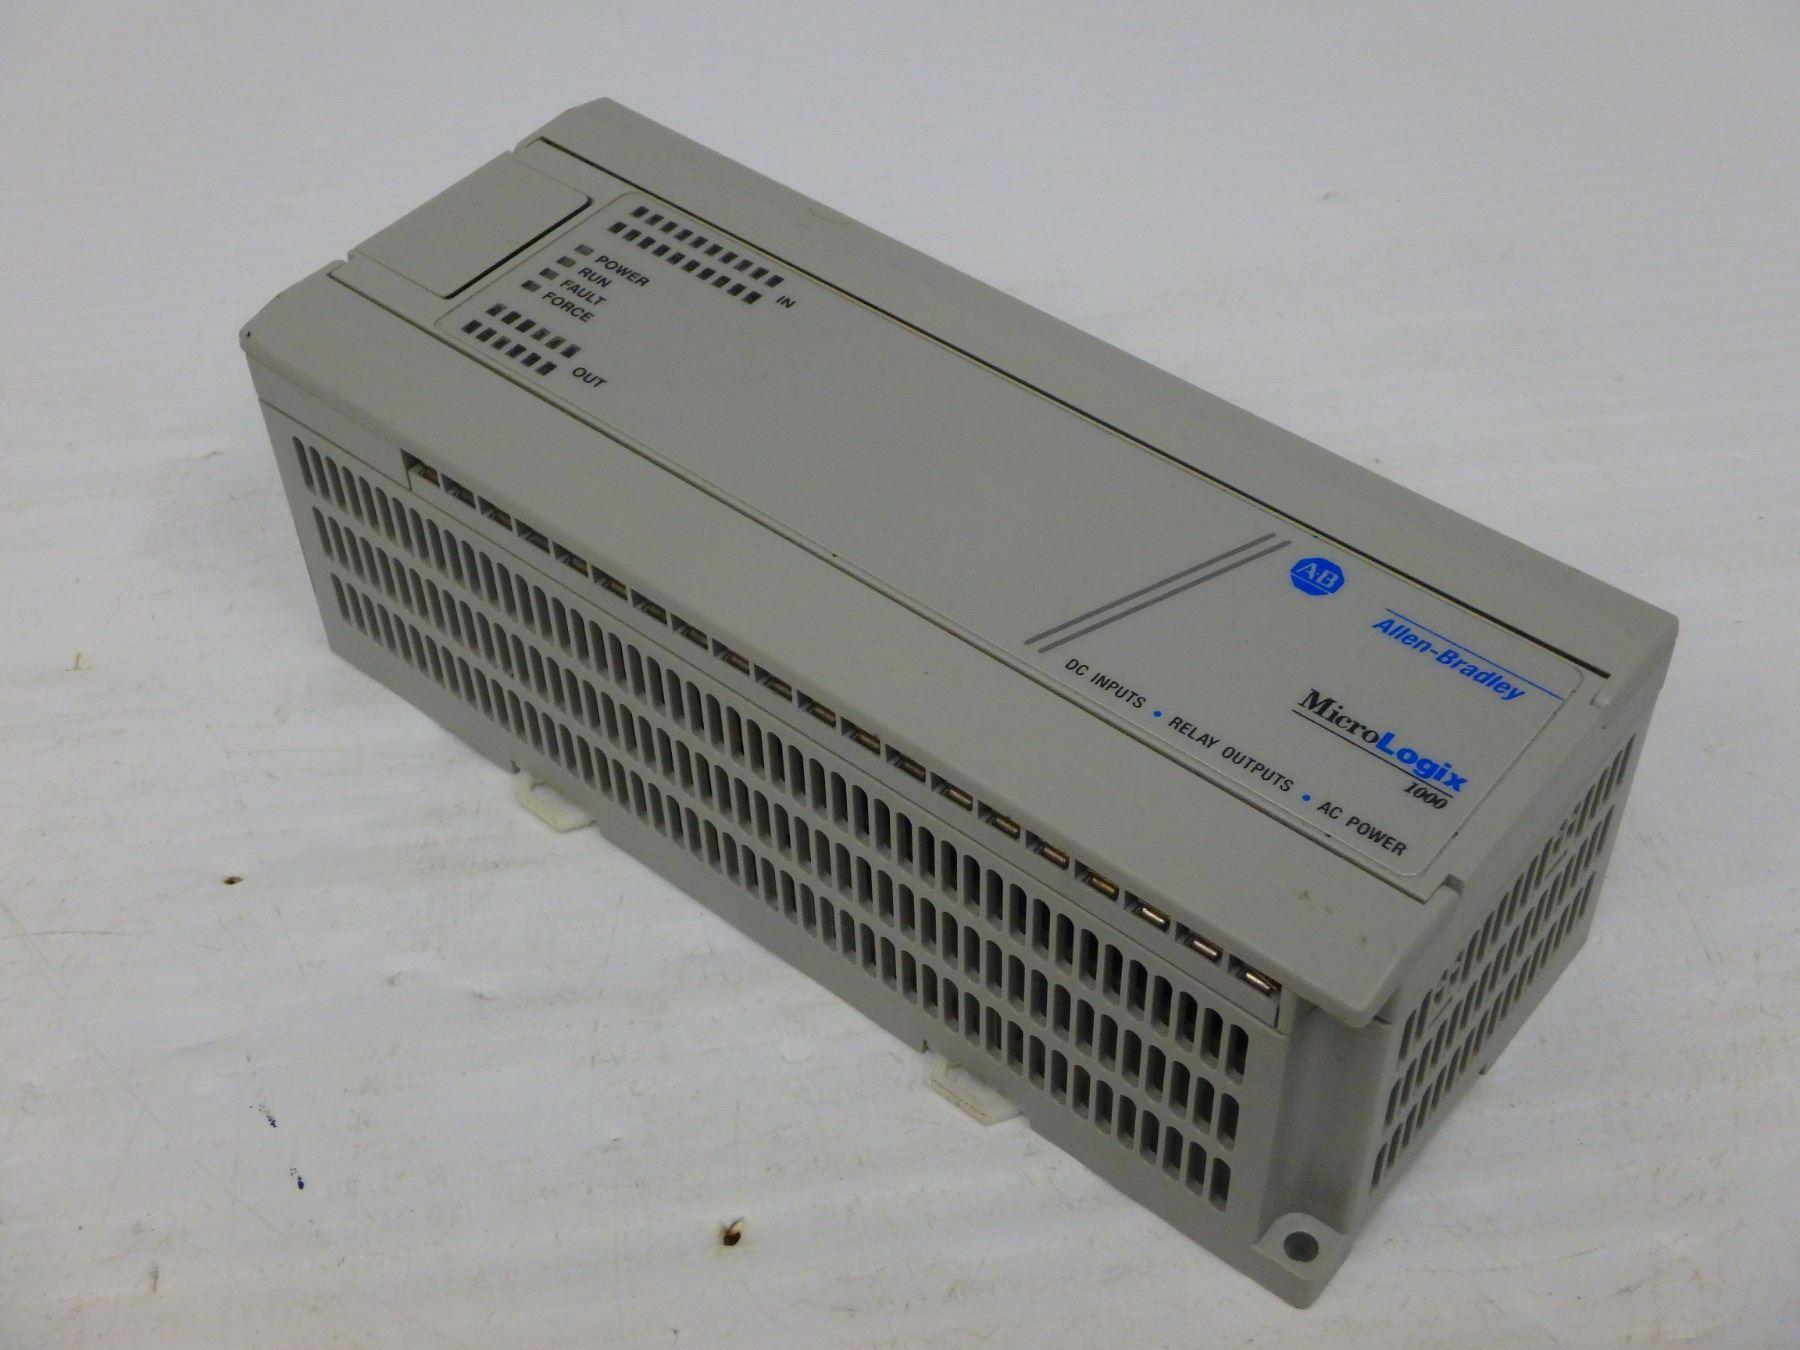 ALLEN BRADLEY 1761-L32BWA MICROLOGIX 1000 PROGRAMMABLE CONTROLLER